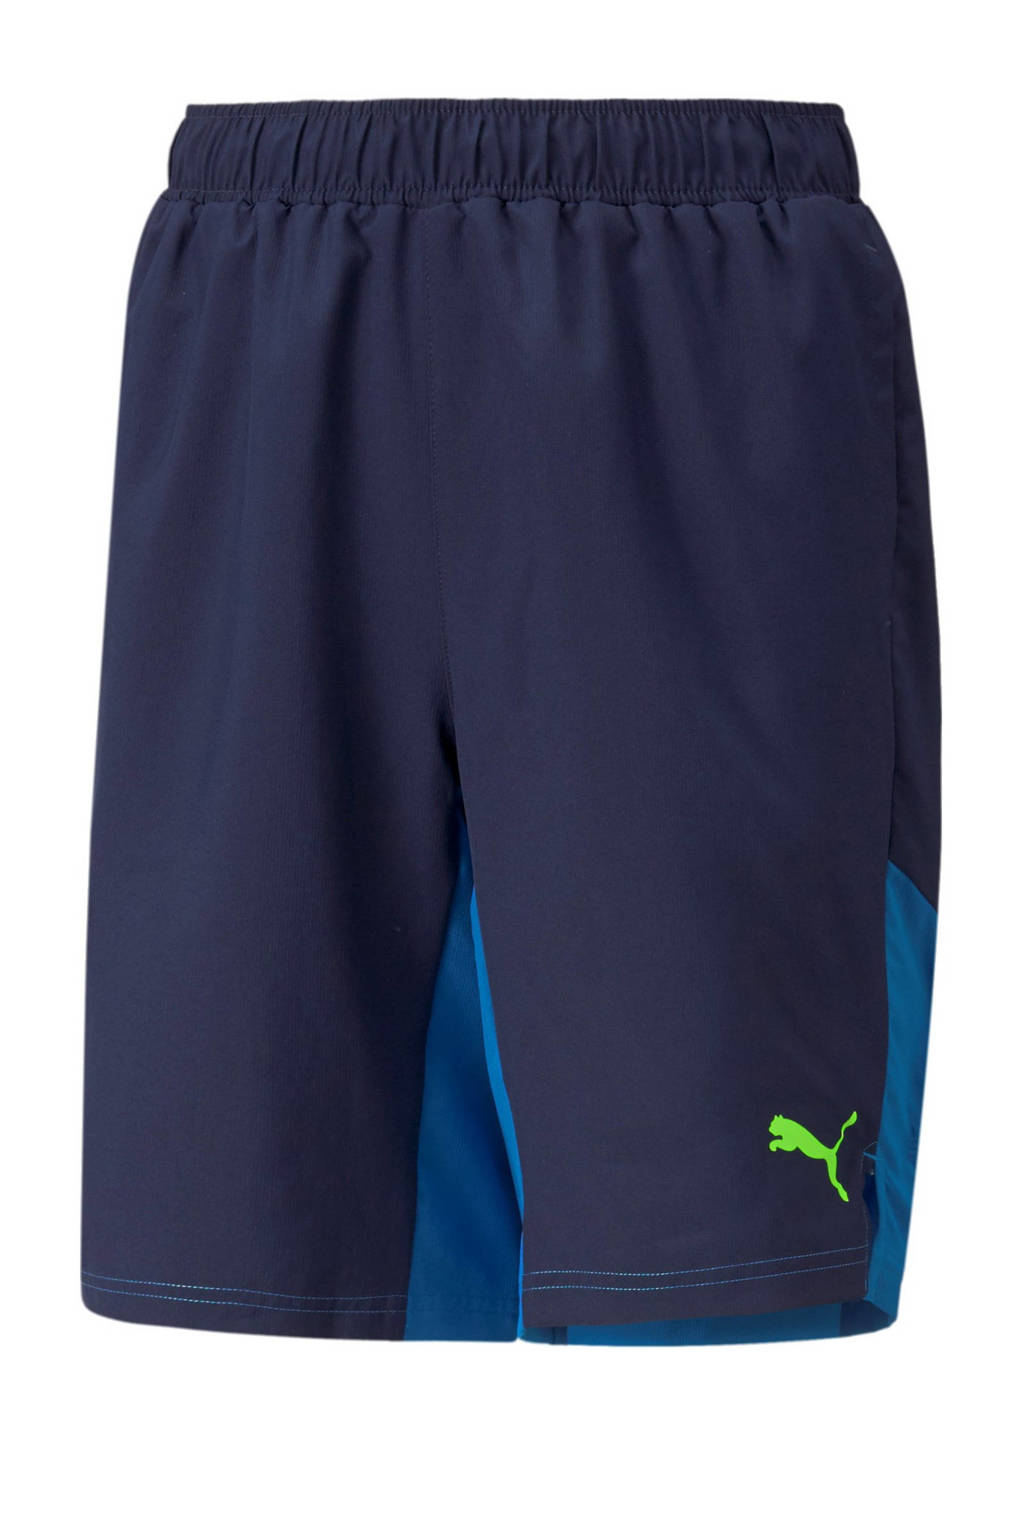 Puma regular fit short van gerecycled polyester donkerblauw/blauw, Donkerblauw/blauw